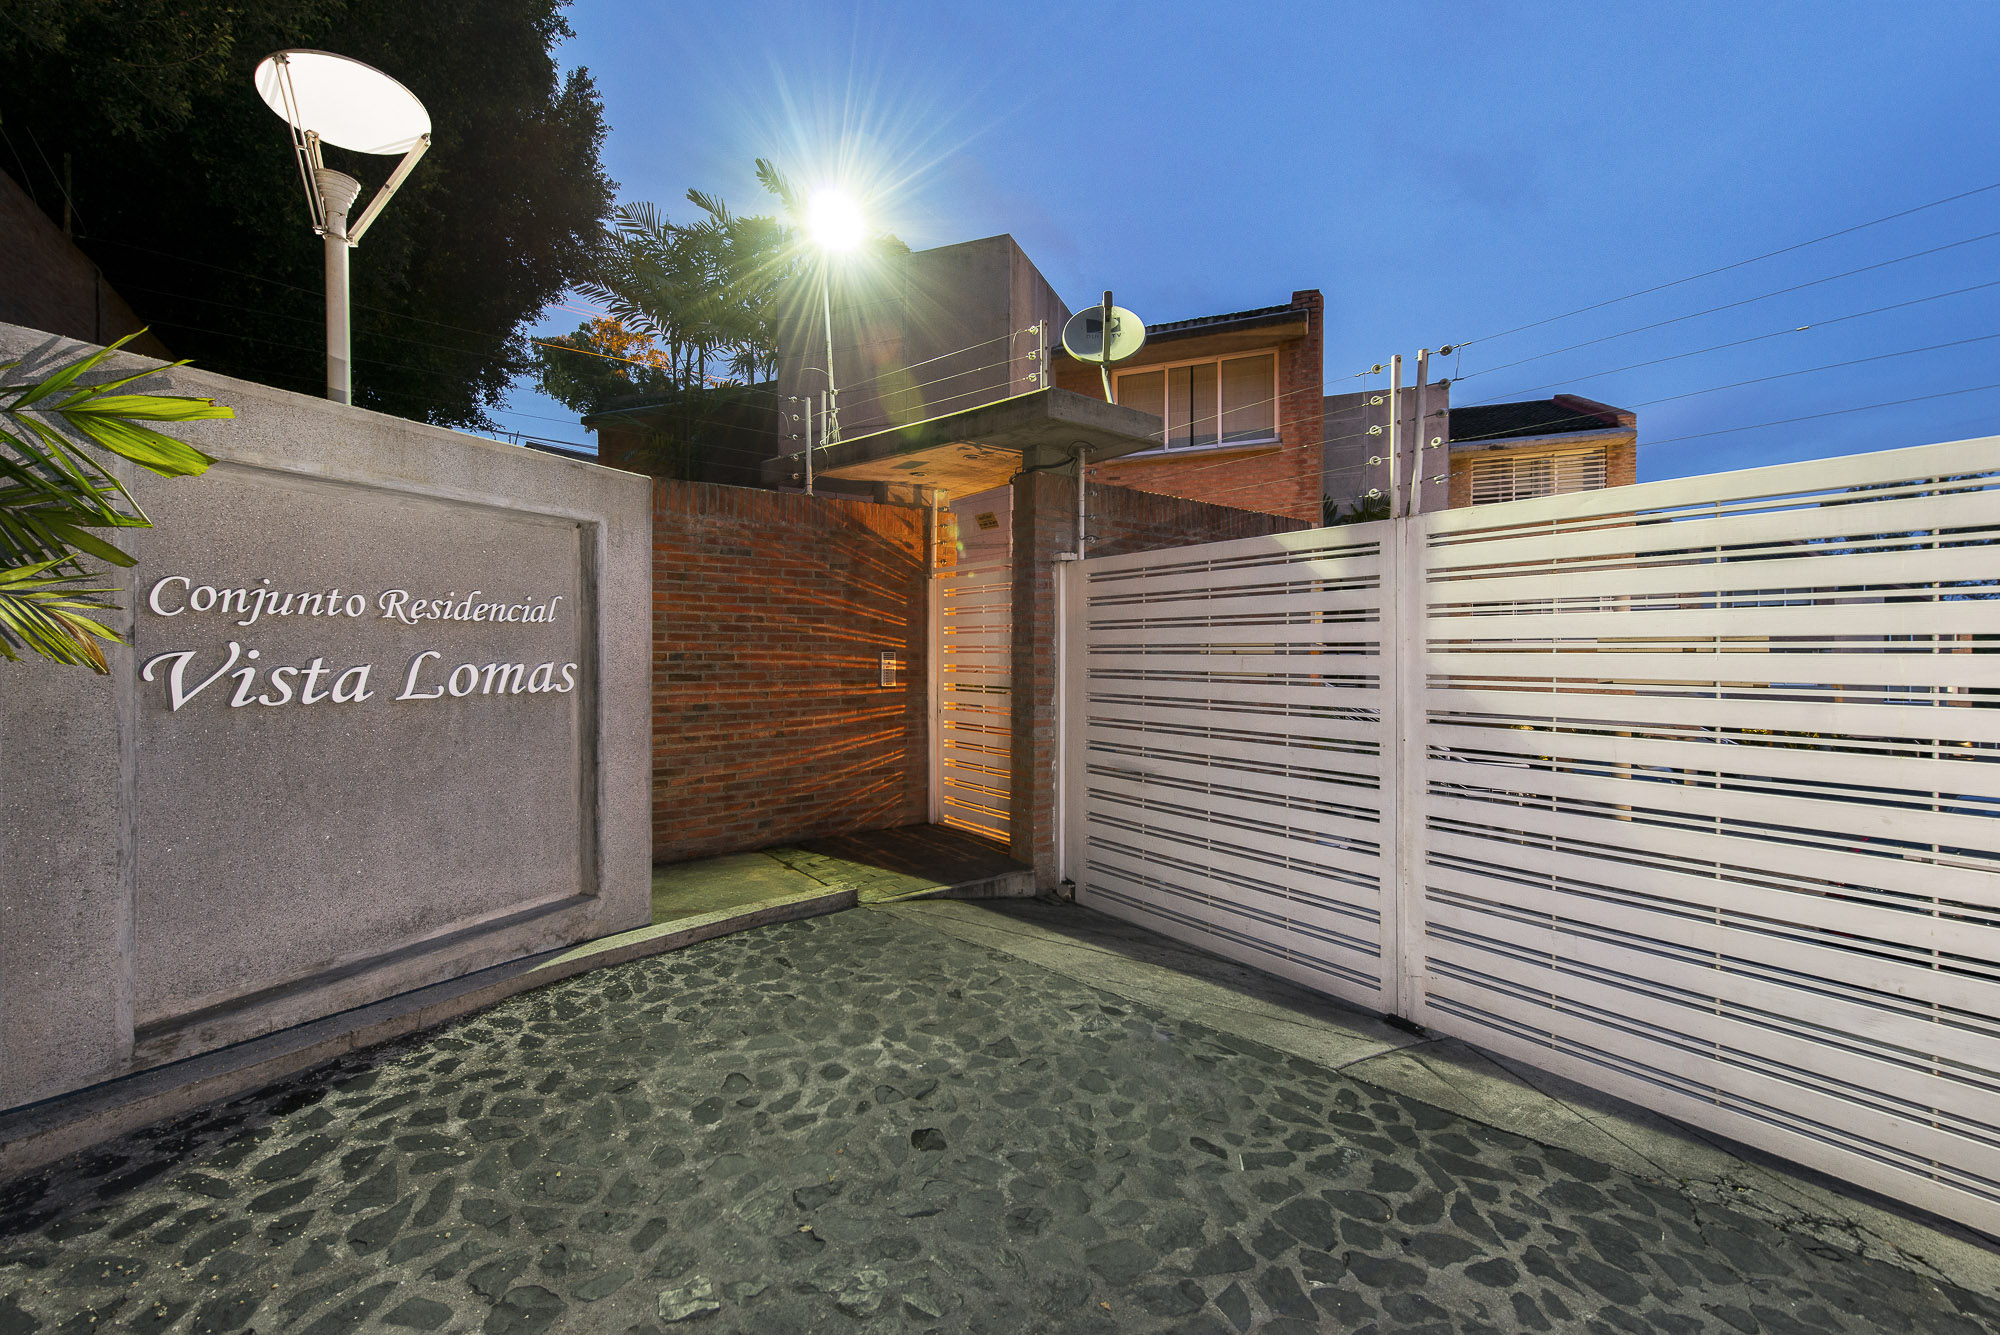 Vista_Loma_entrada-2